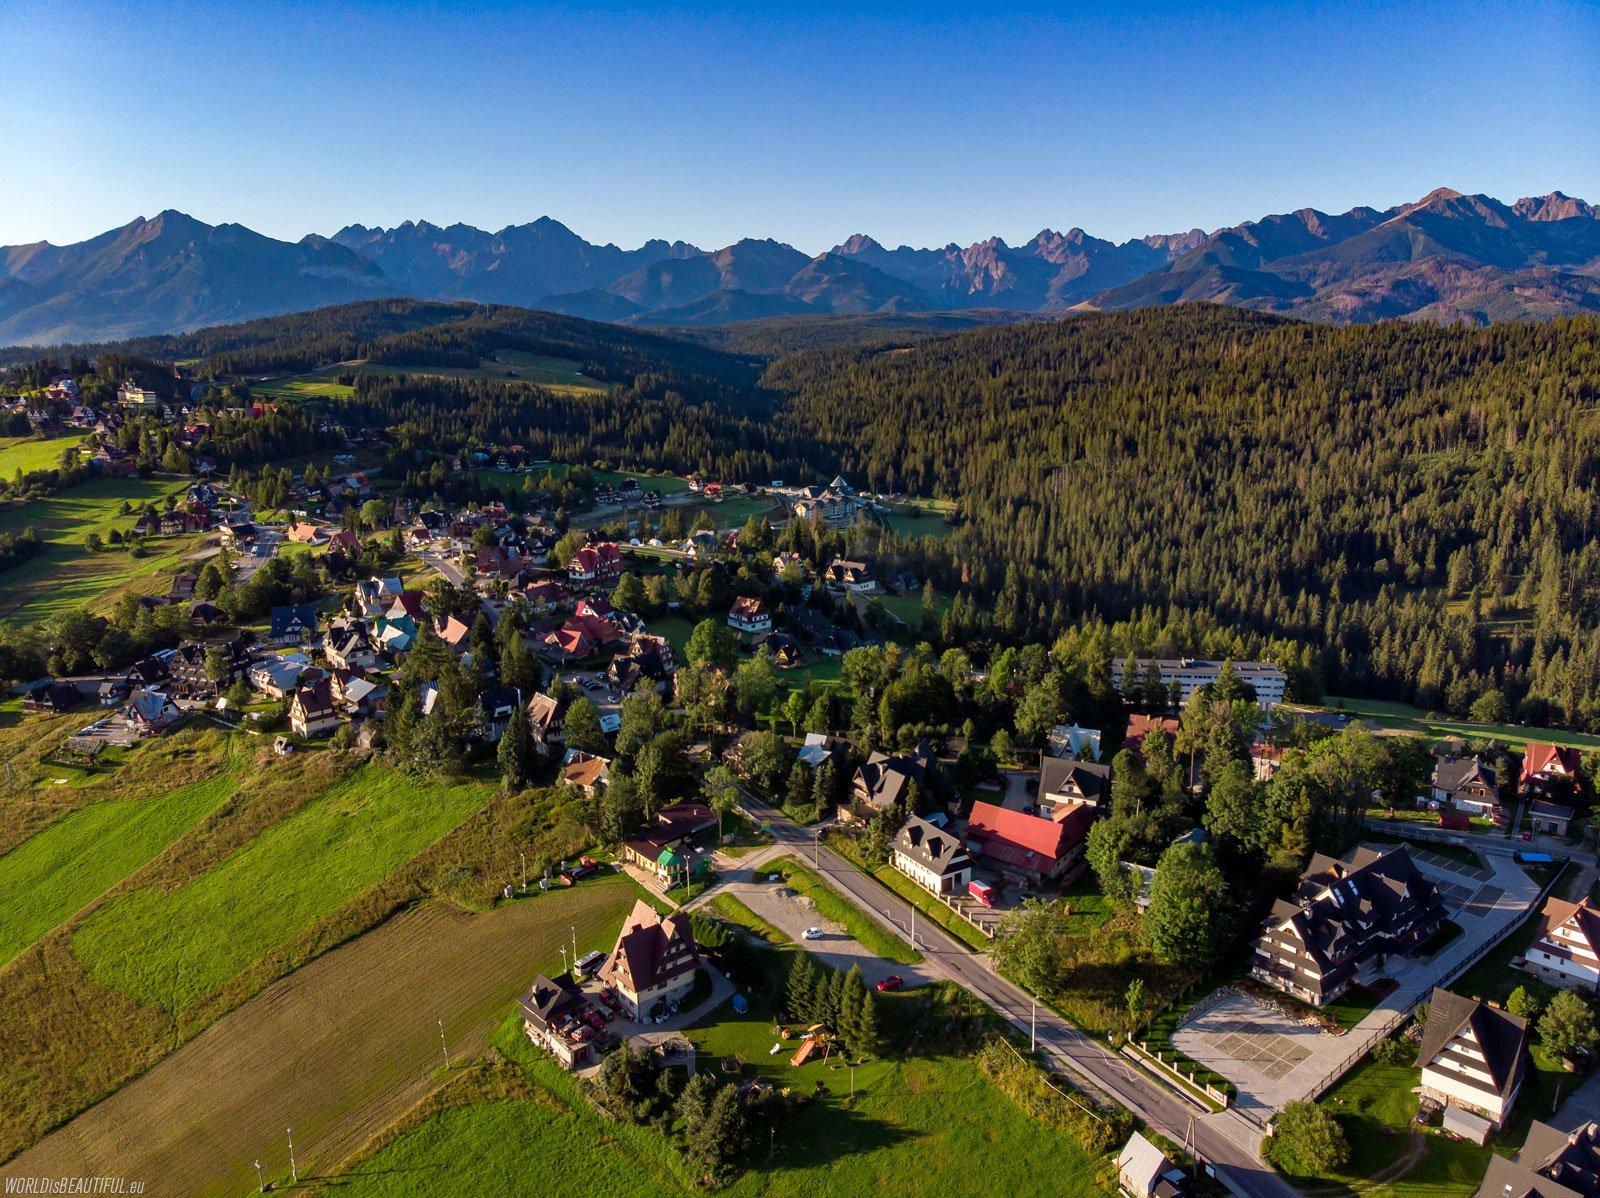 Bukowina Tatrzańska and the panorama of the Tatra Mountains